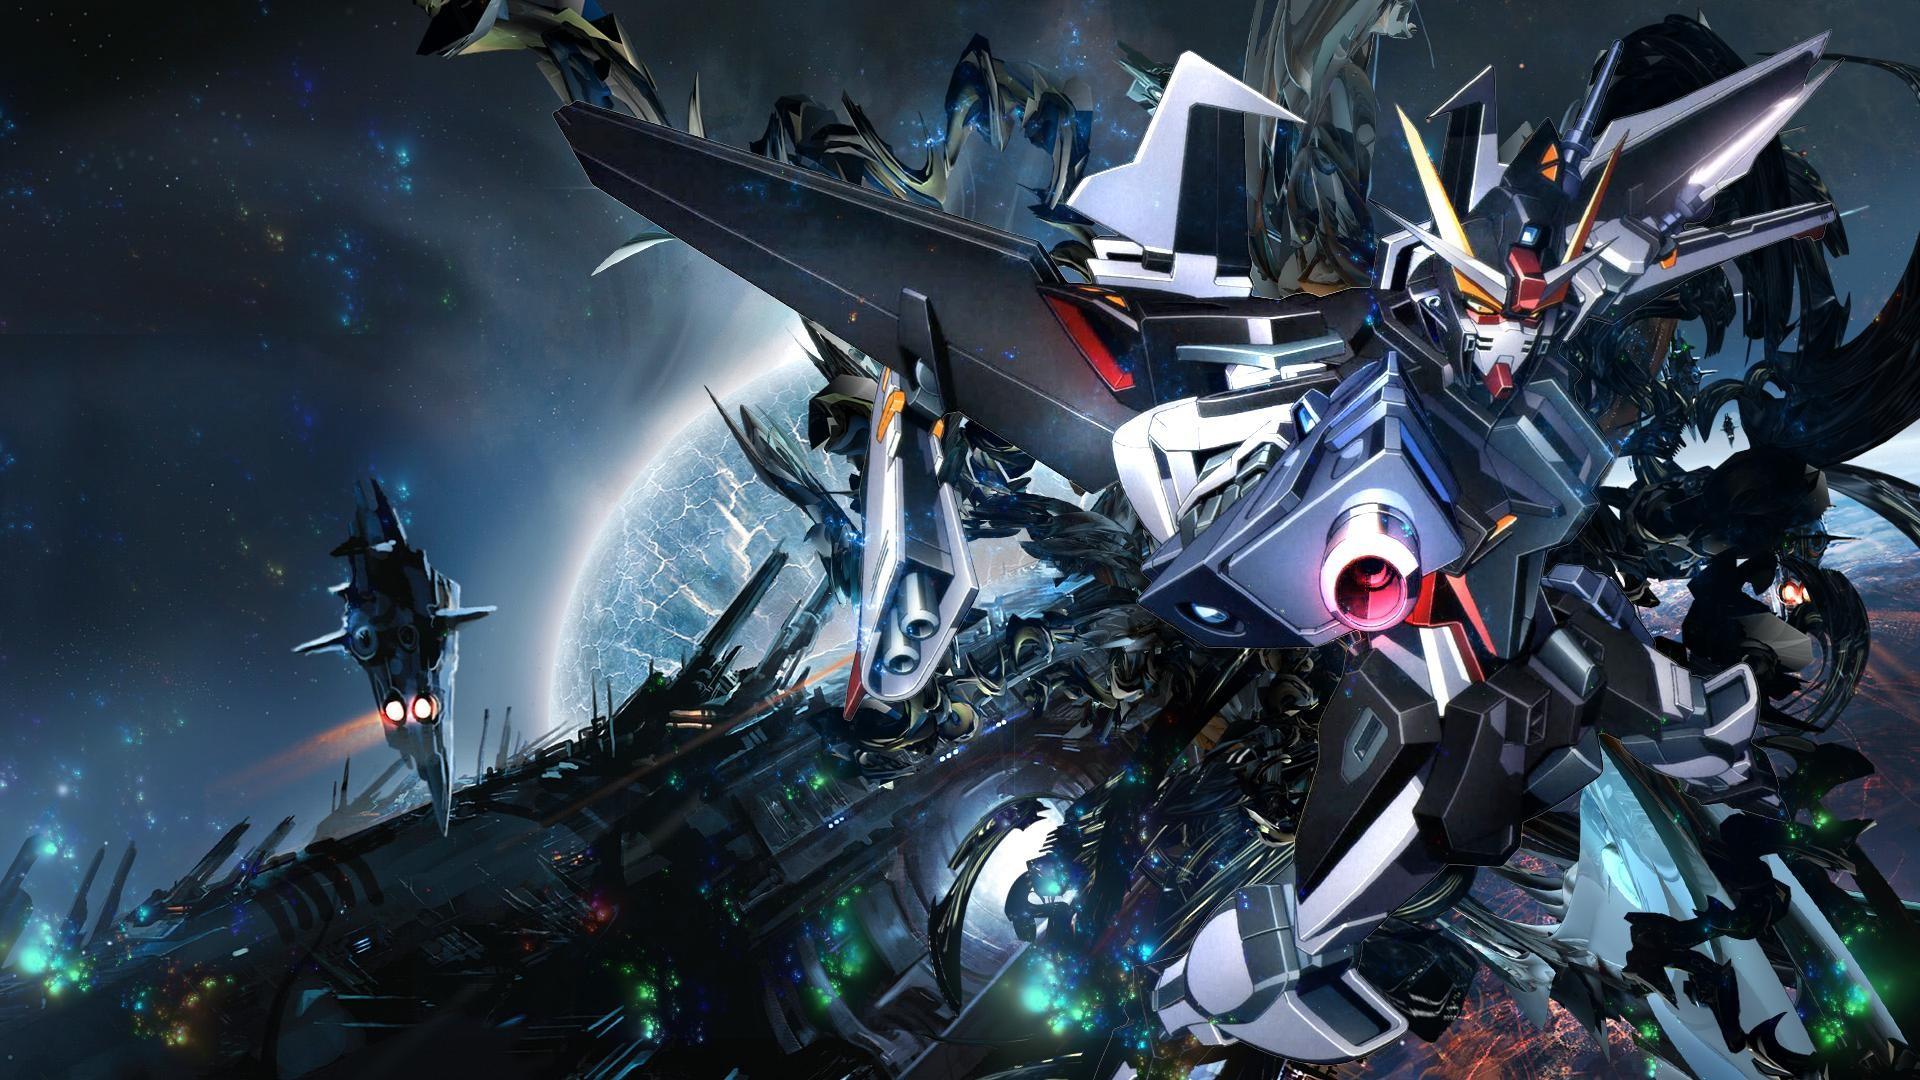 Mobile Suit Gundam Wallpapers Desktop Background As Wallpaper HD